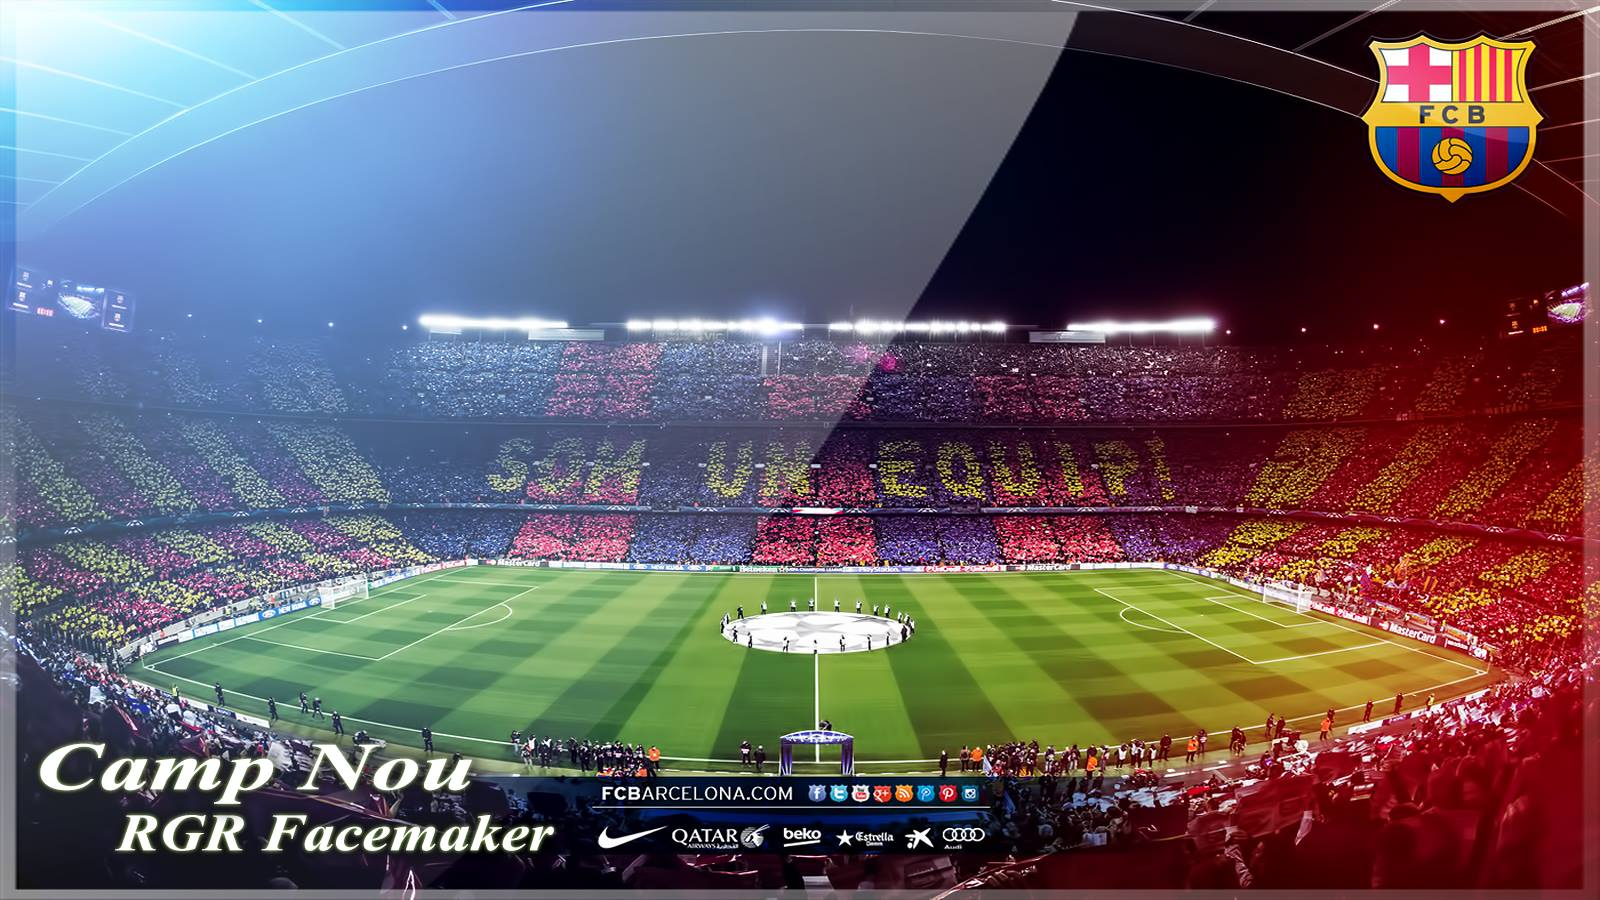 PES 2013 Camp Nou by Rgr Facemaker